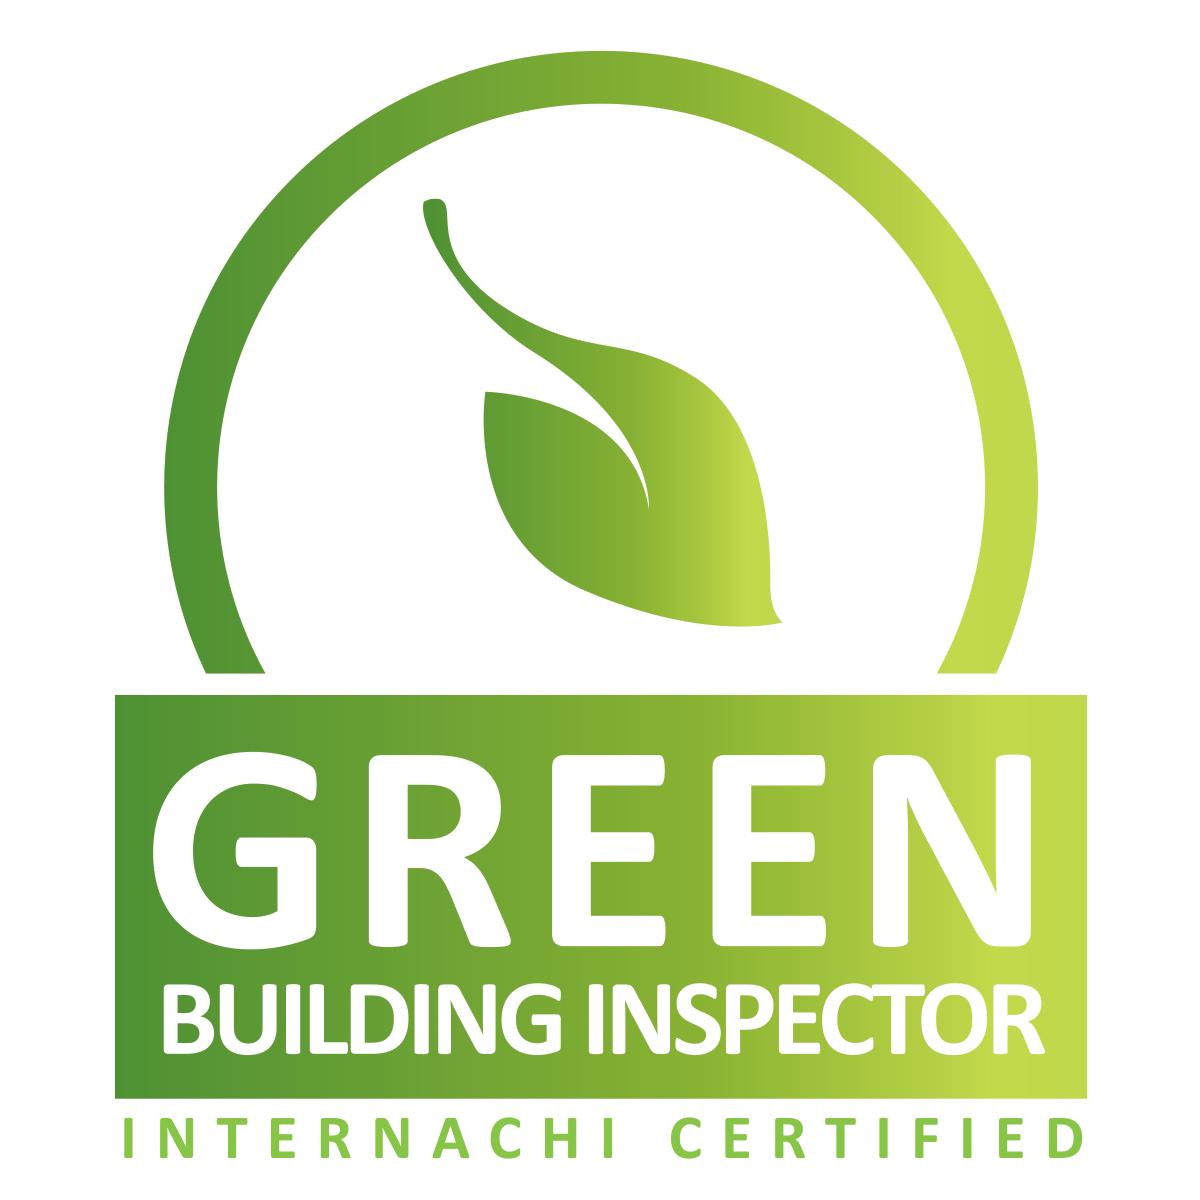 become a certified green building inspector internachi